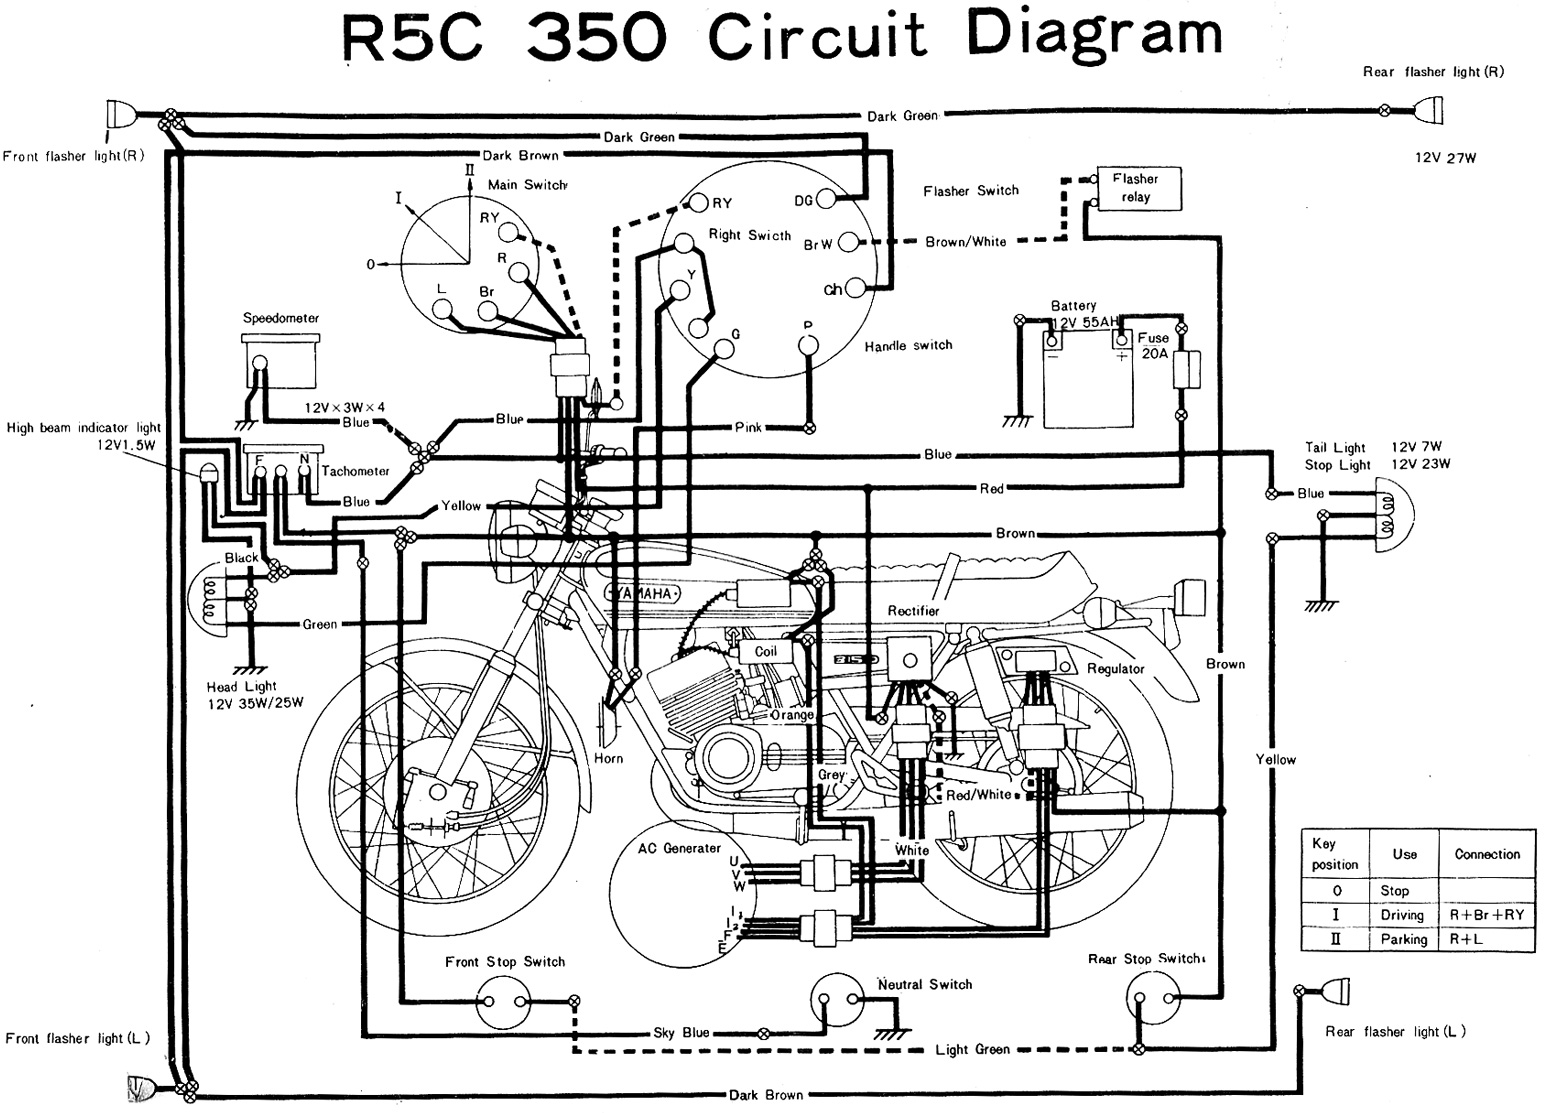 Stunning Pocket Bike Wiring Diagram Ideas - Wiring Diagram Ideas ...